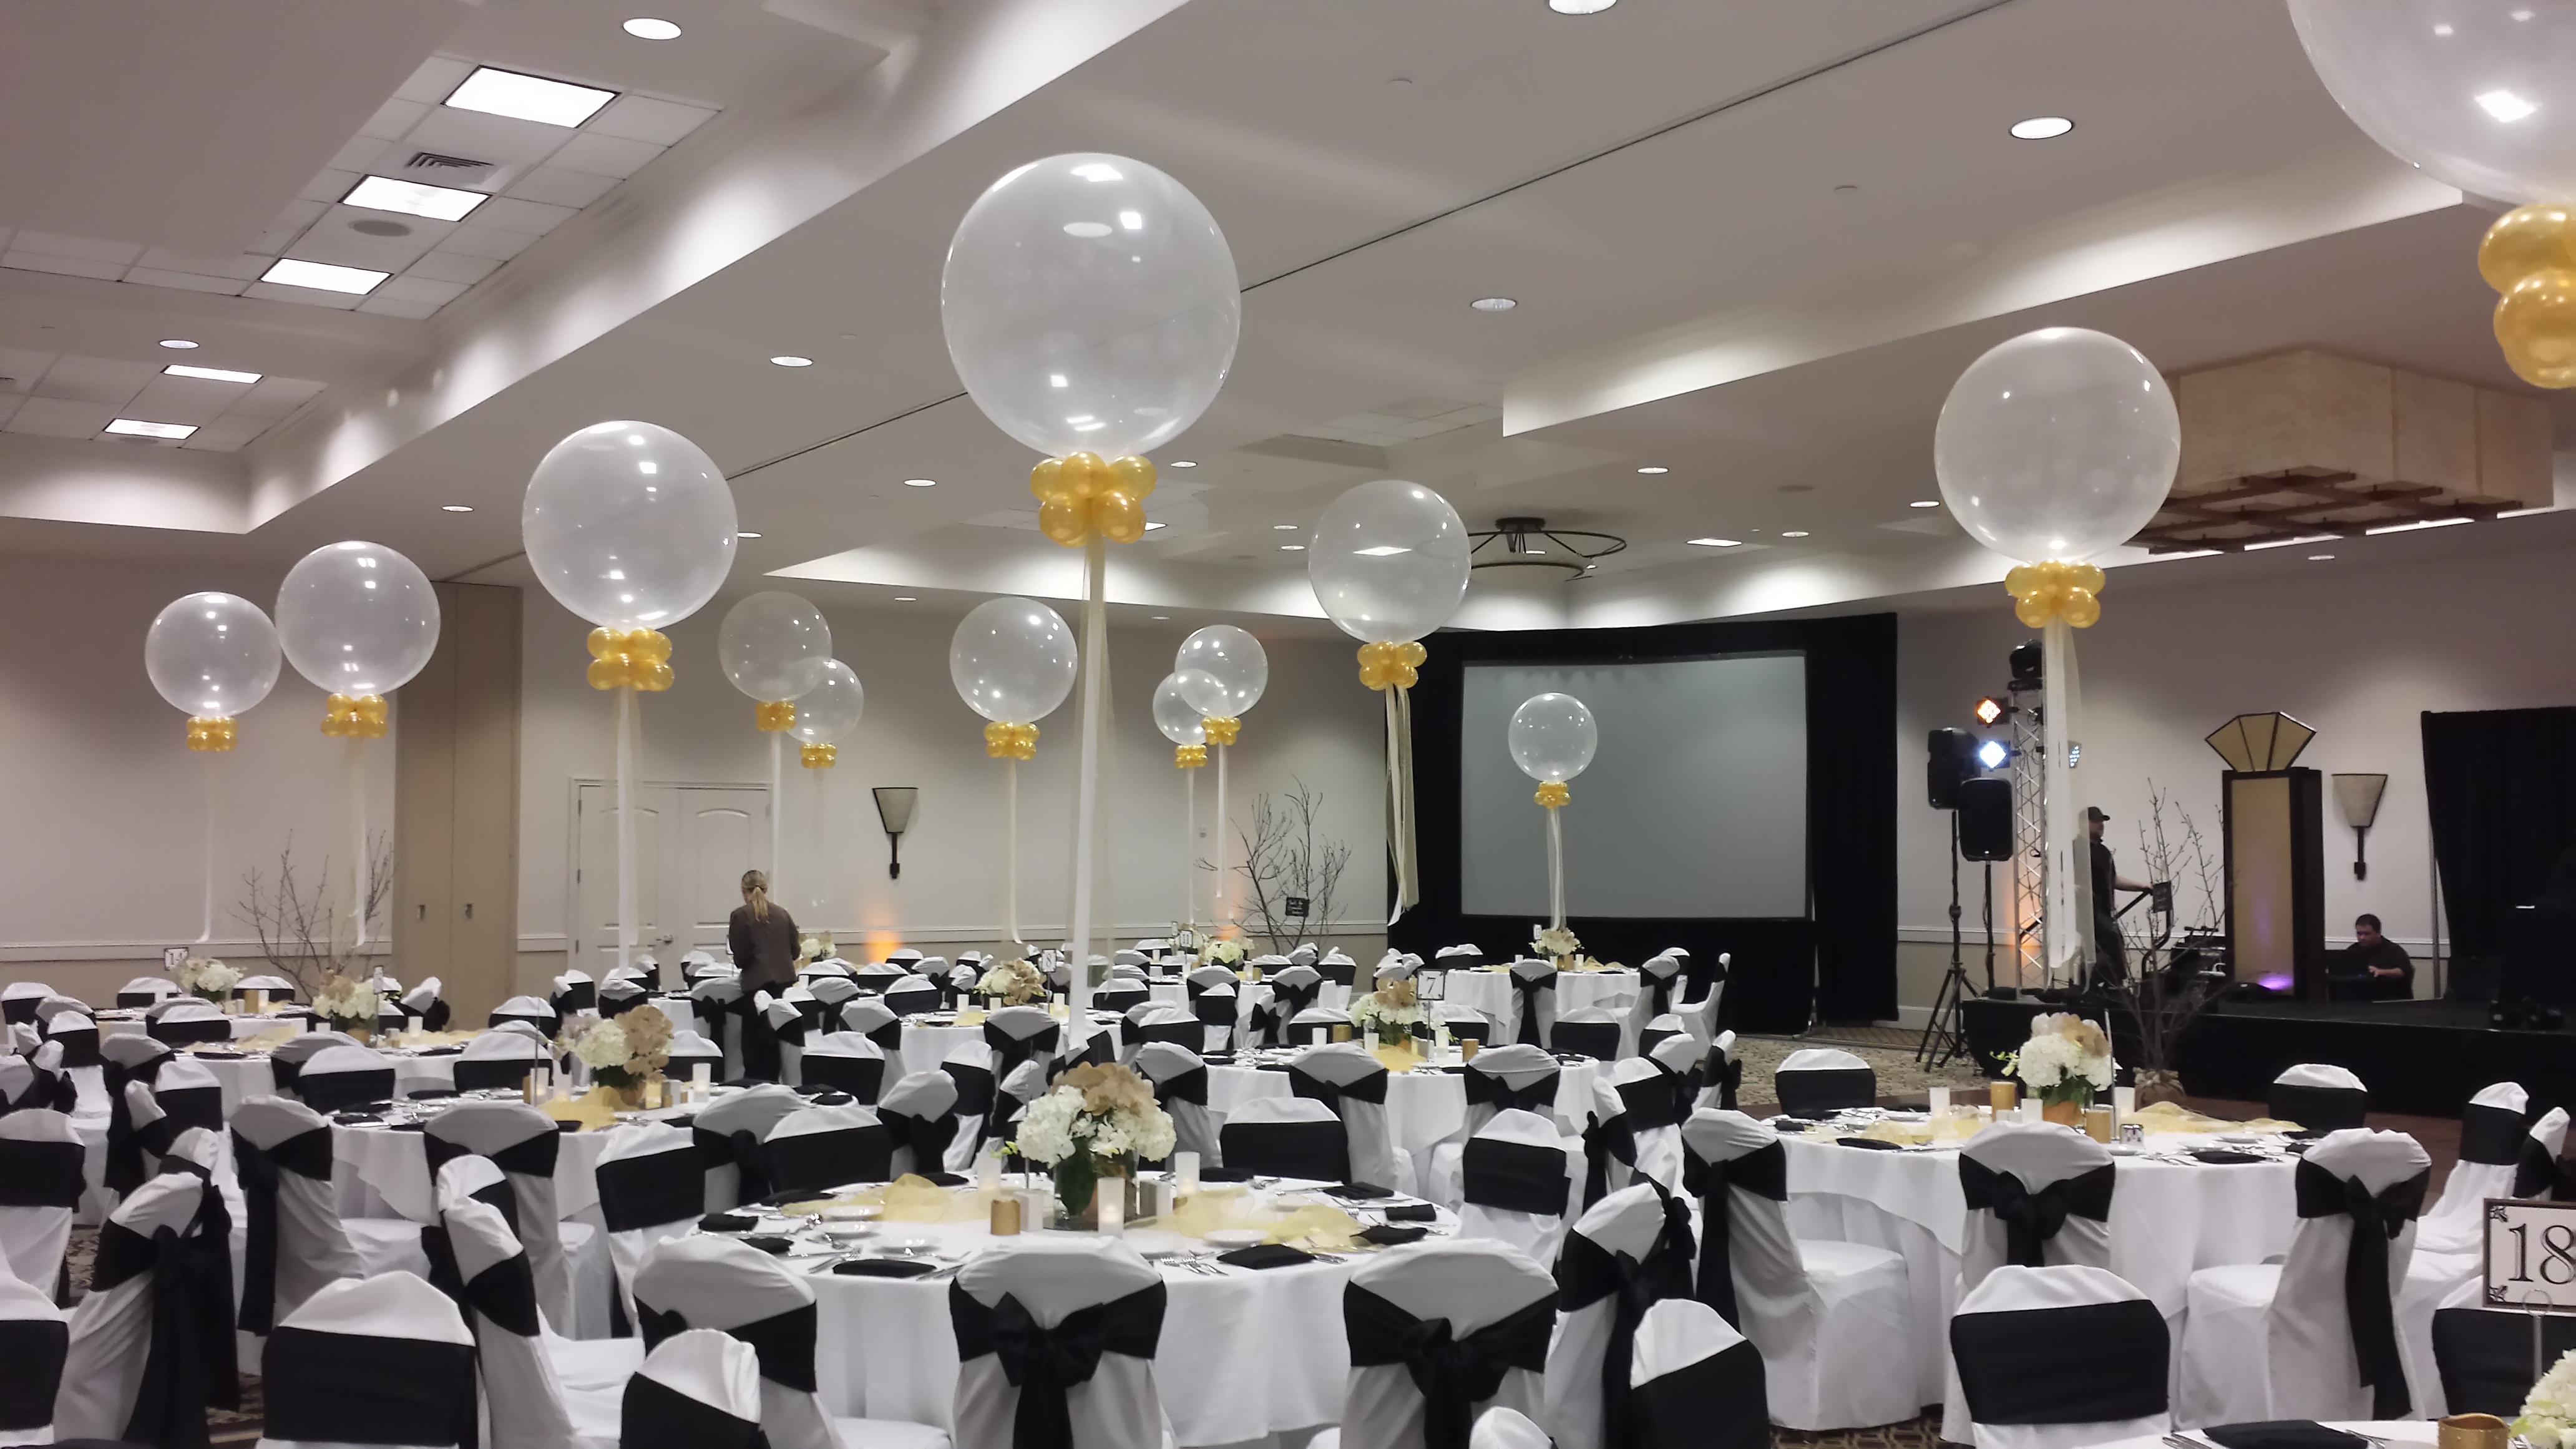 Best Banquet Halls & Wedding Venues In Hyderabad